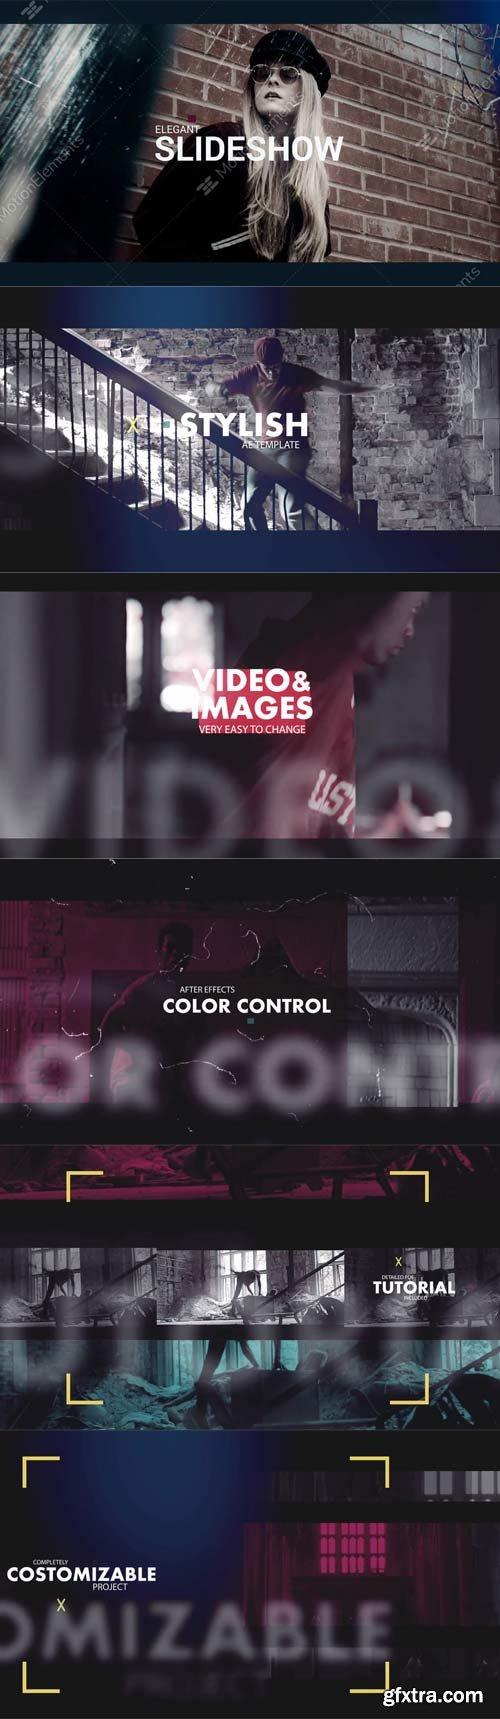 MotionElements - Modern Fashion Slideshow - 11597071